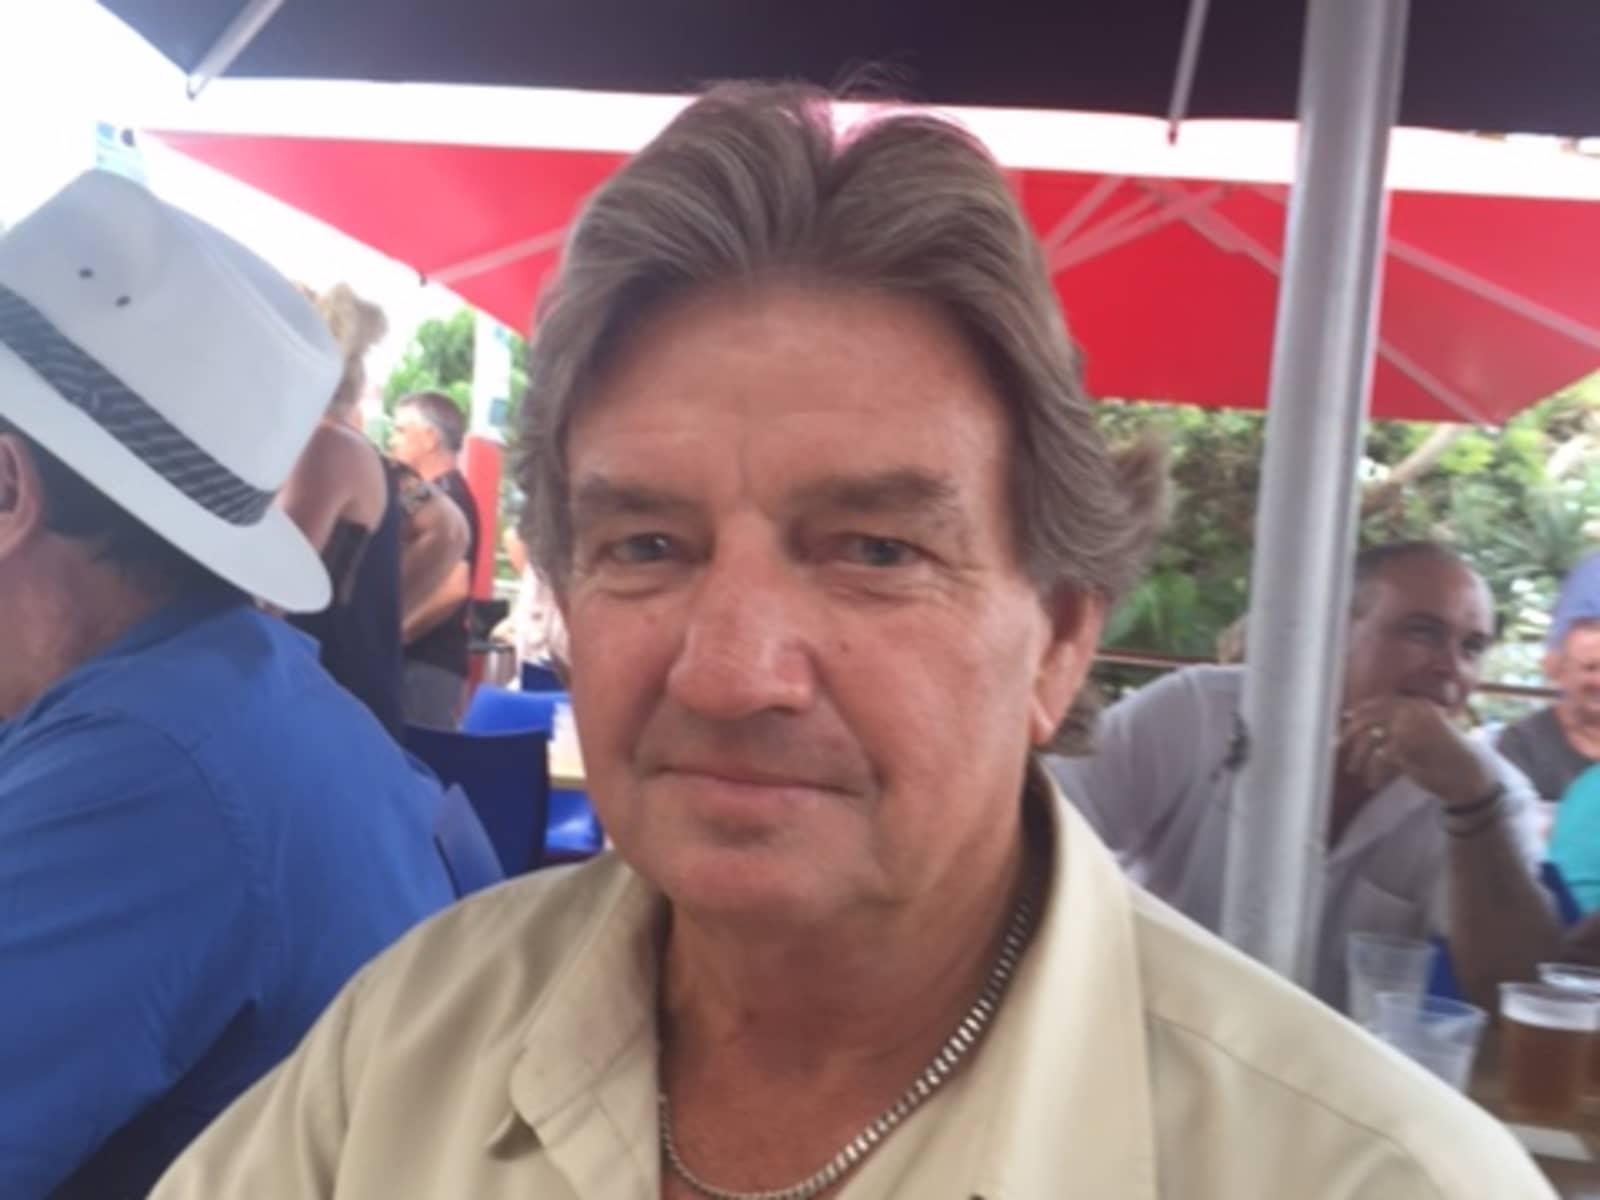 Patrick from Noosa Heads, Queensland, Australia